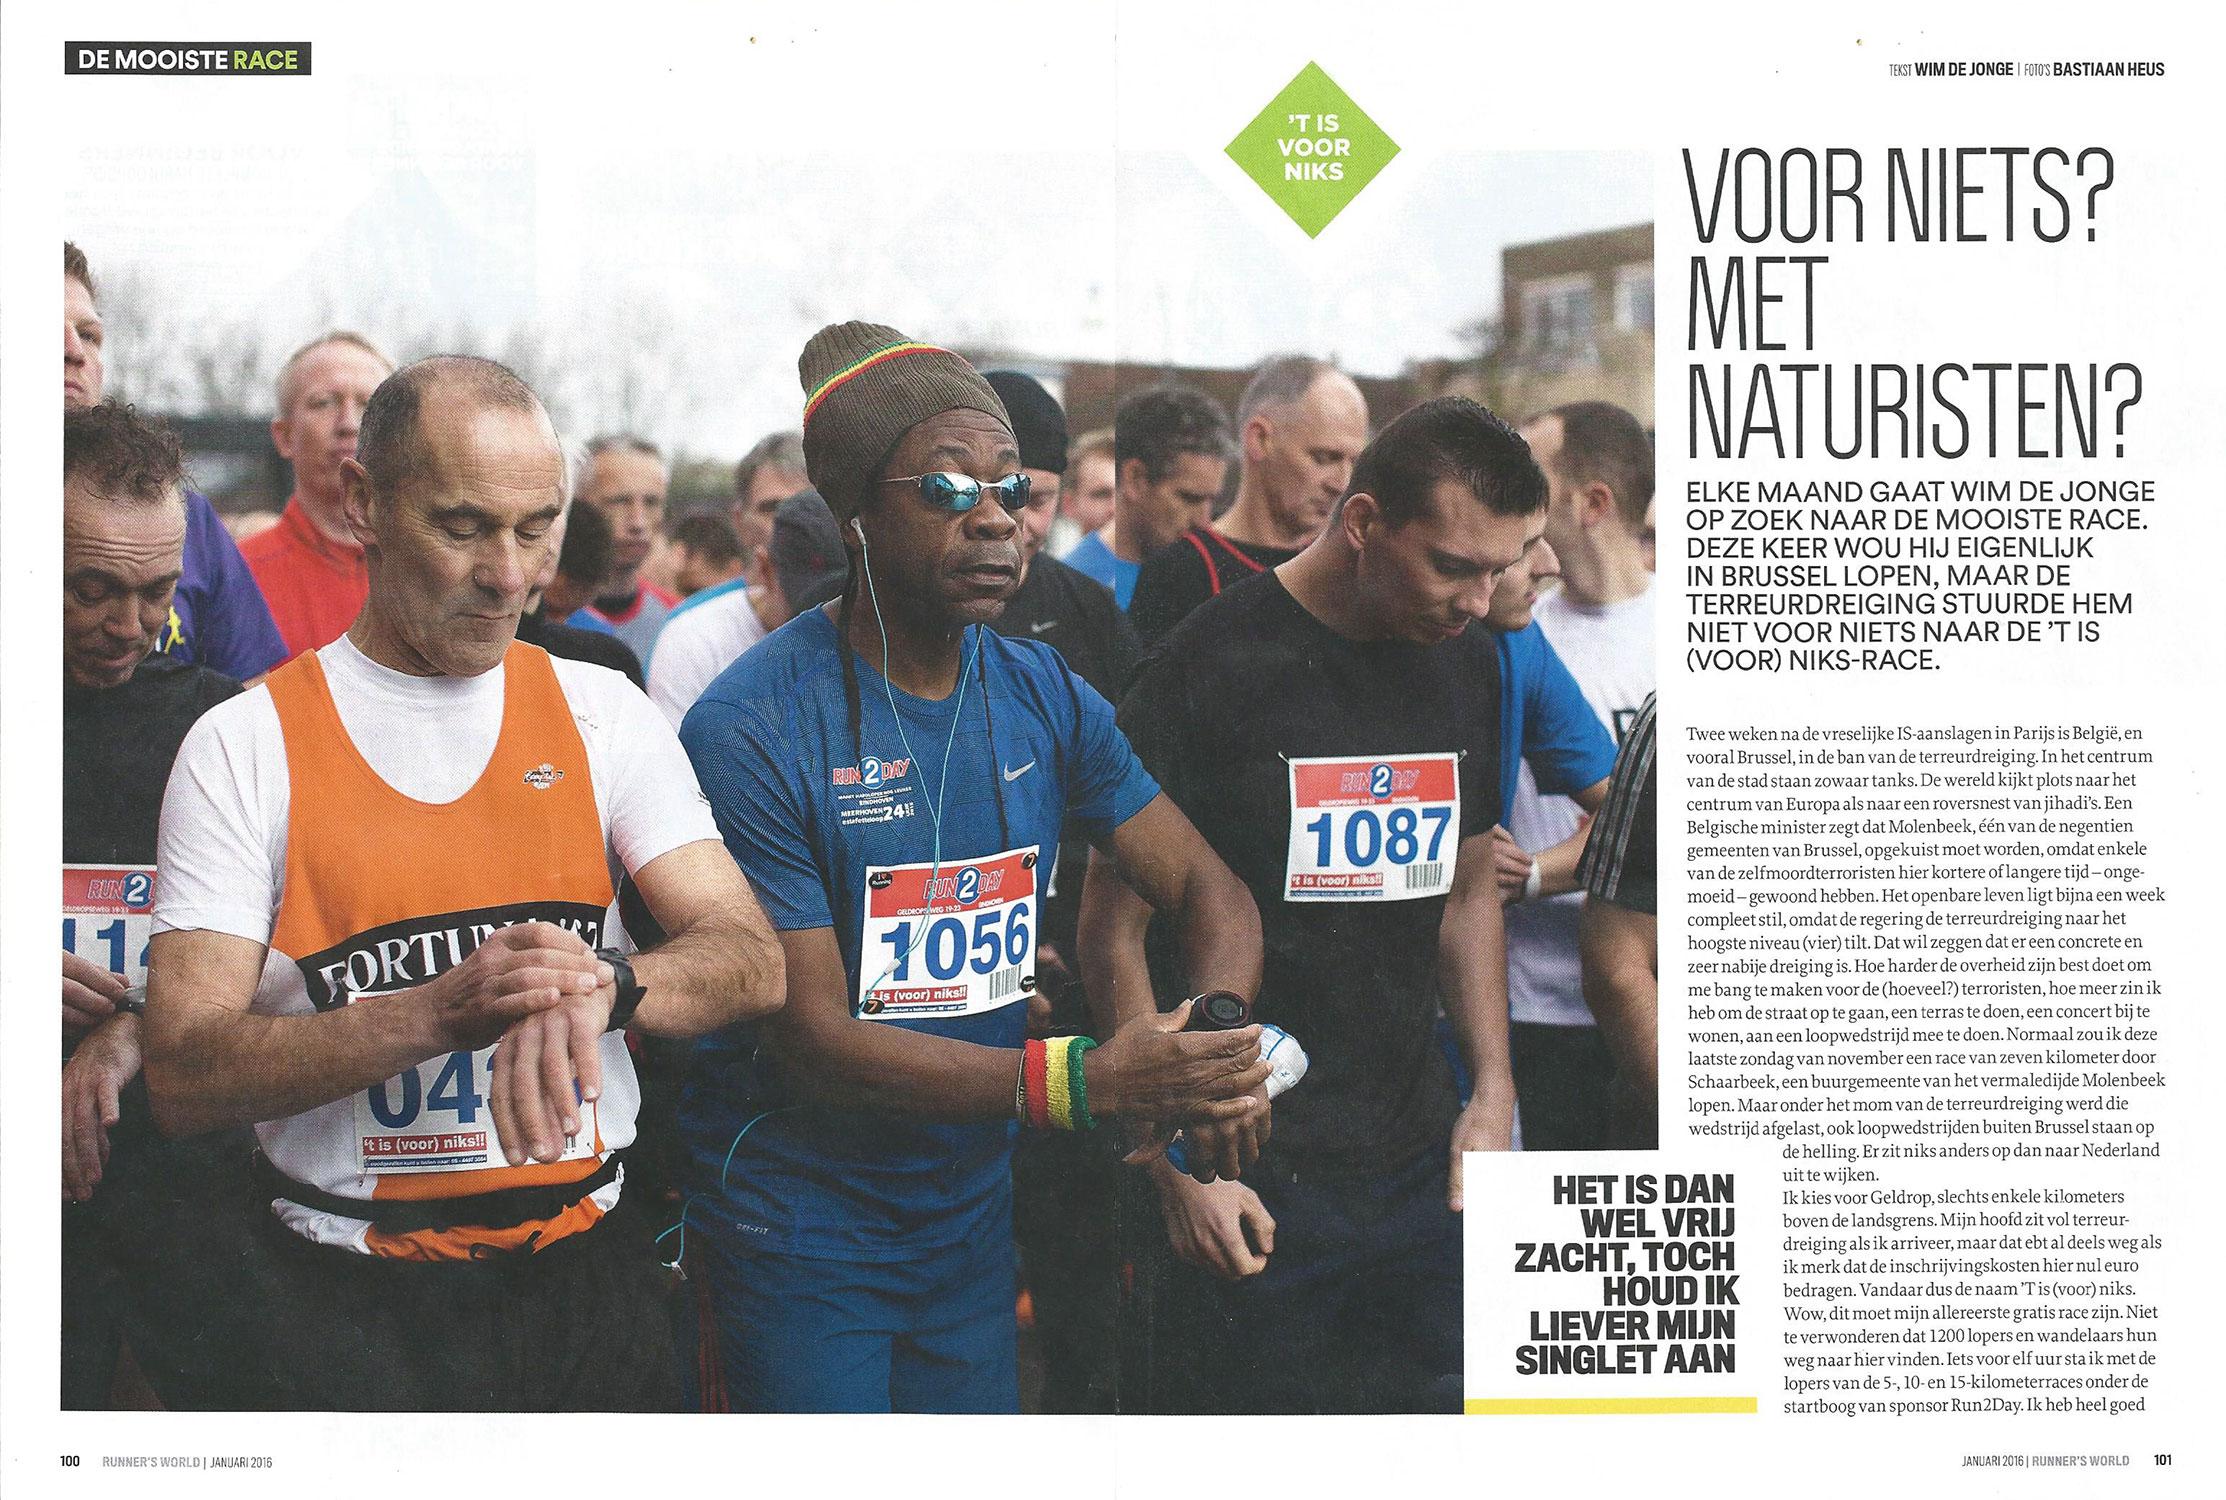 Artikel Runnersworld 2016 - Pagina 1/2